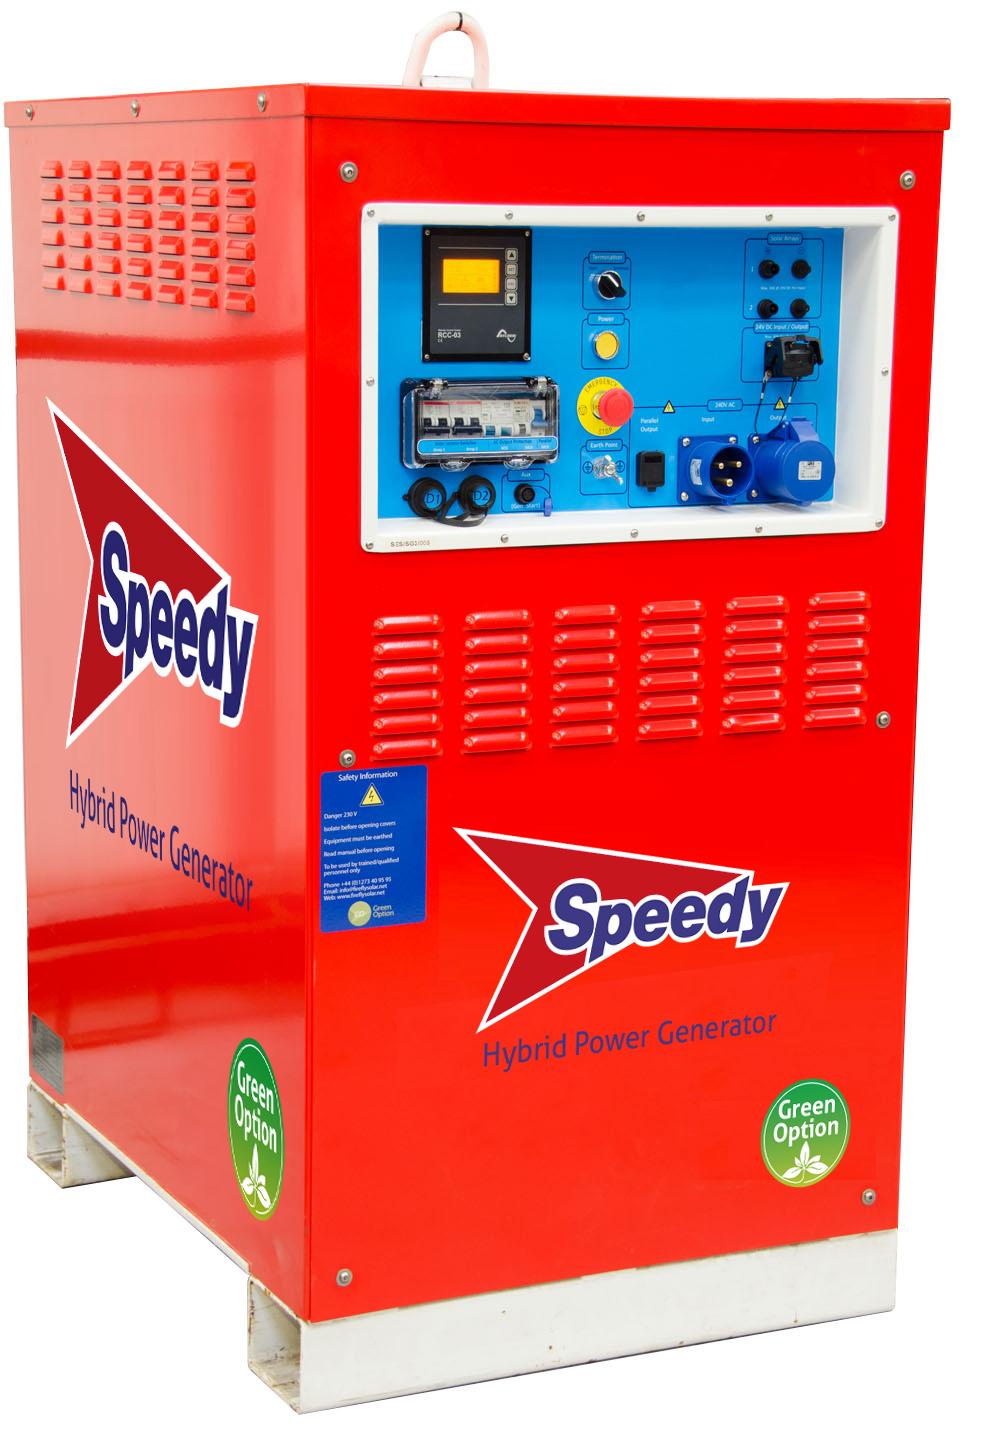 Speedy 3.5-5 kVA Firefly Cygnus Hybrid Power Generator.jpg